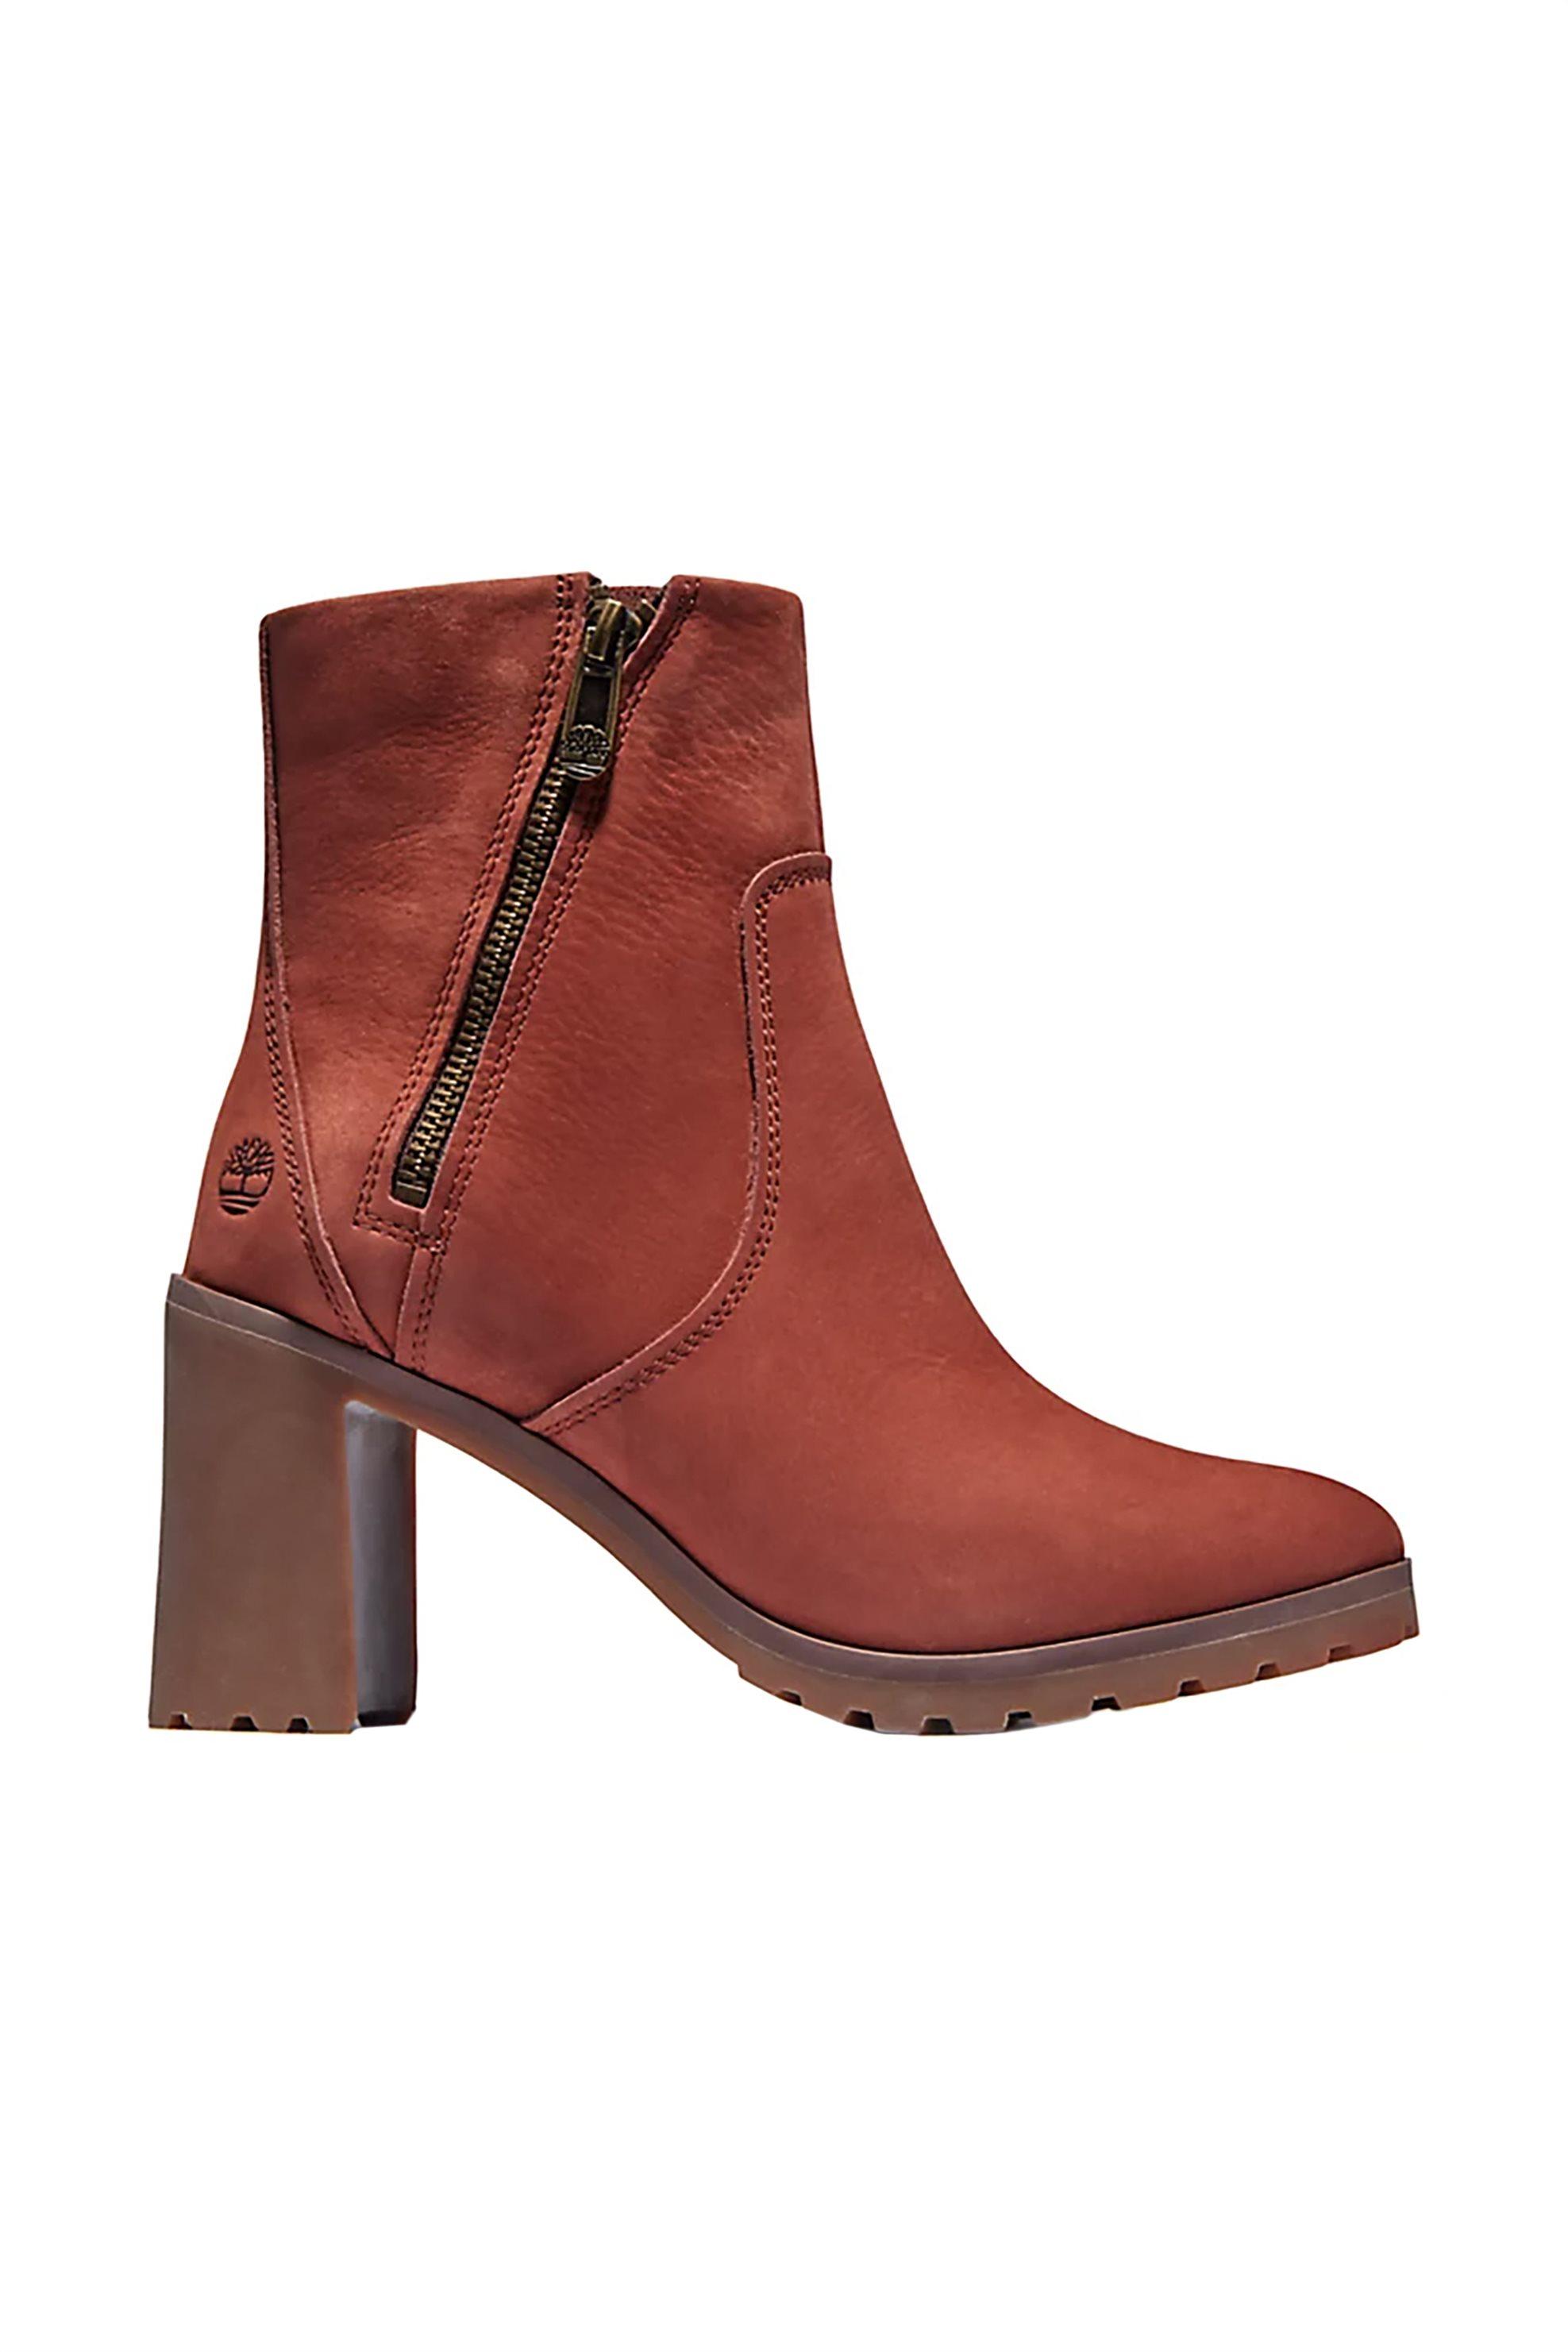 "Timberland γυναικεία δερμάτινα μποτάκια ""Allington Ankle"" – TB0A2511CH71 – Κεραμιδί"